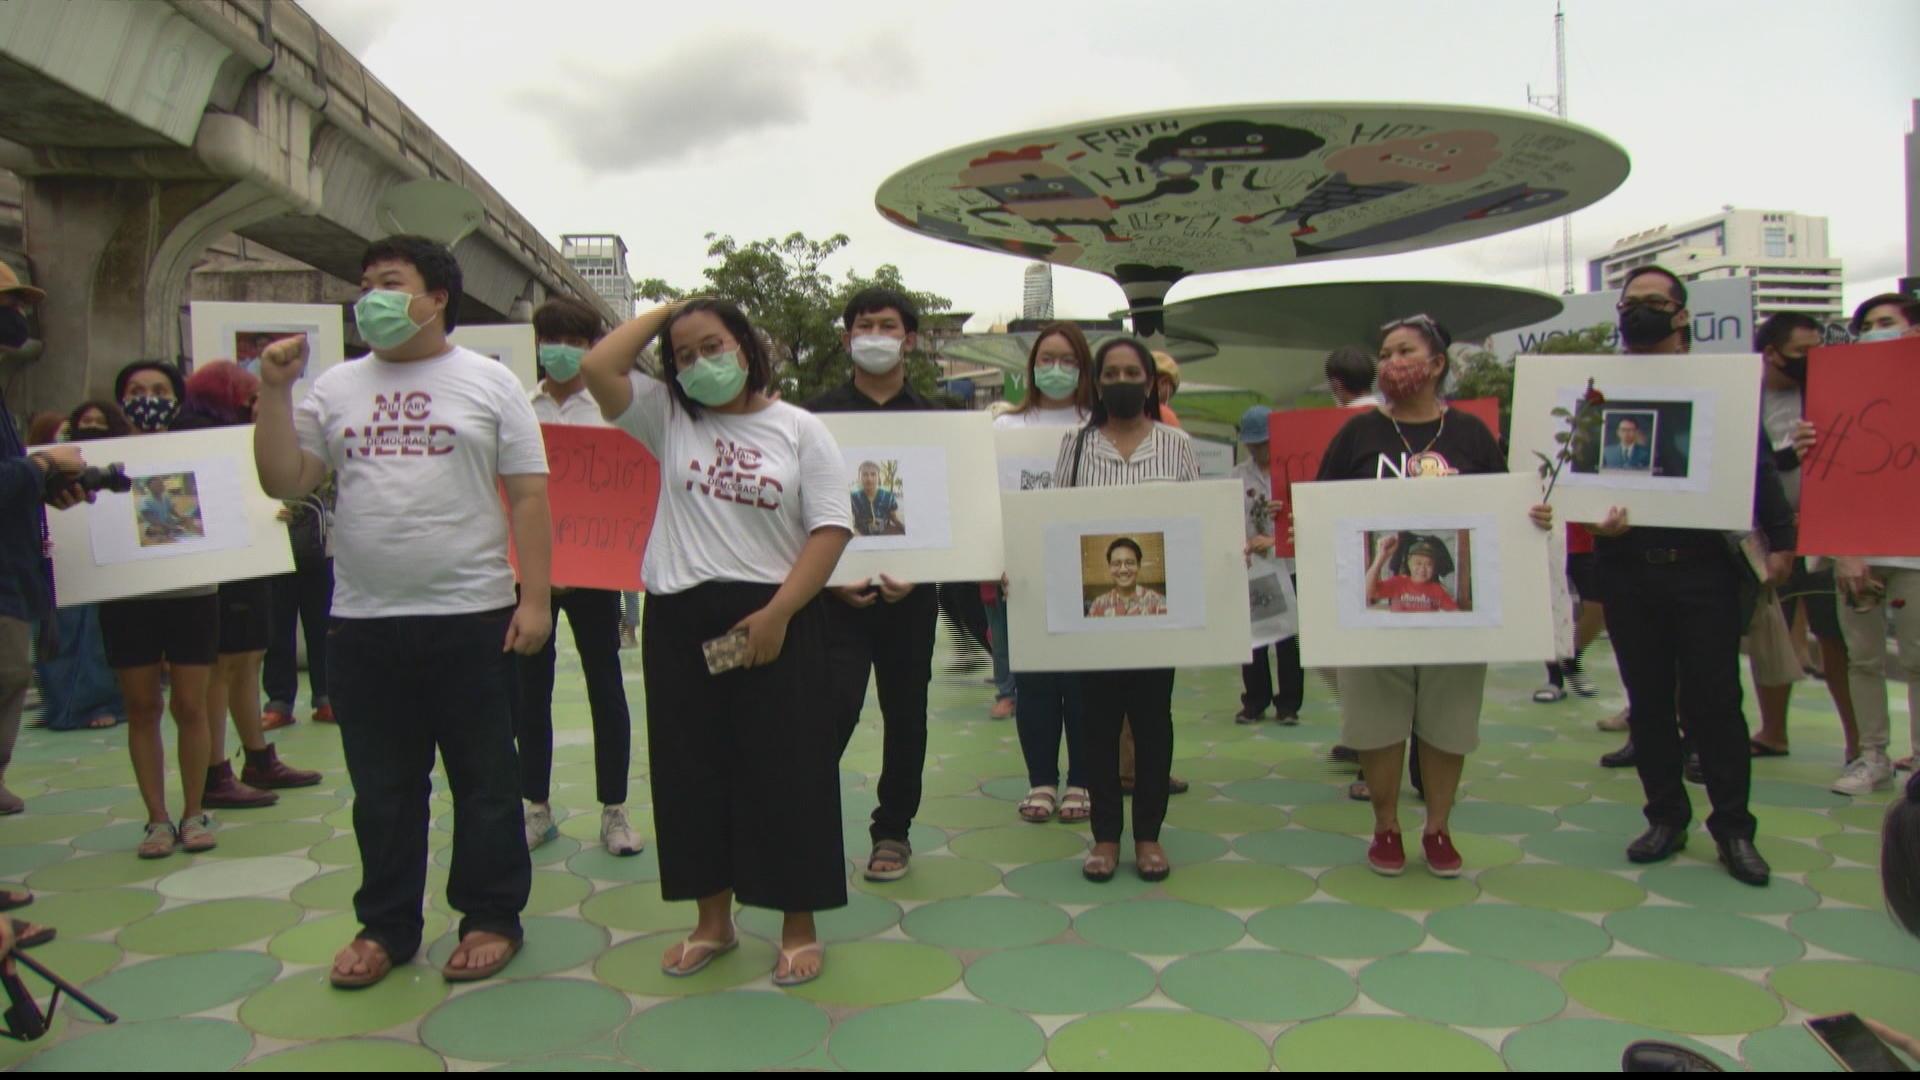 Thai gov't pressured to acknowledge activist's disappearance